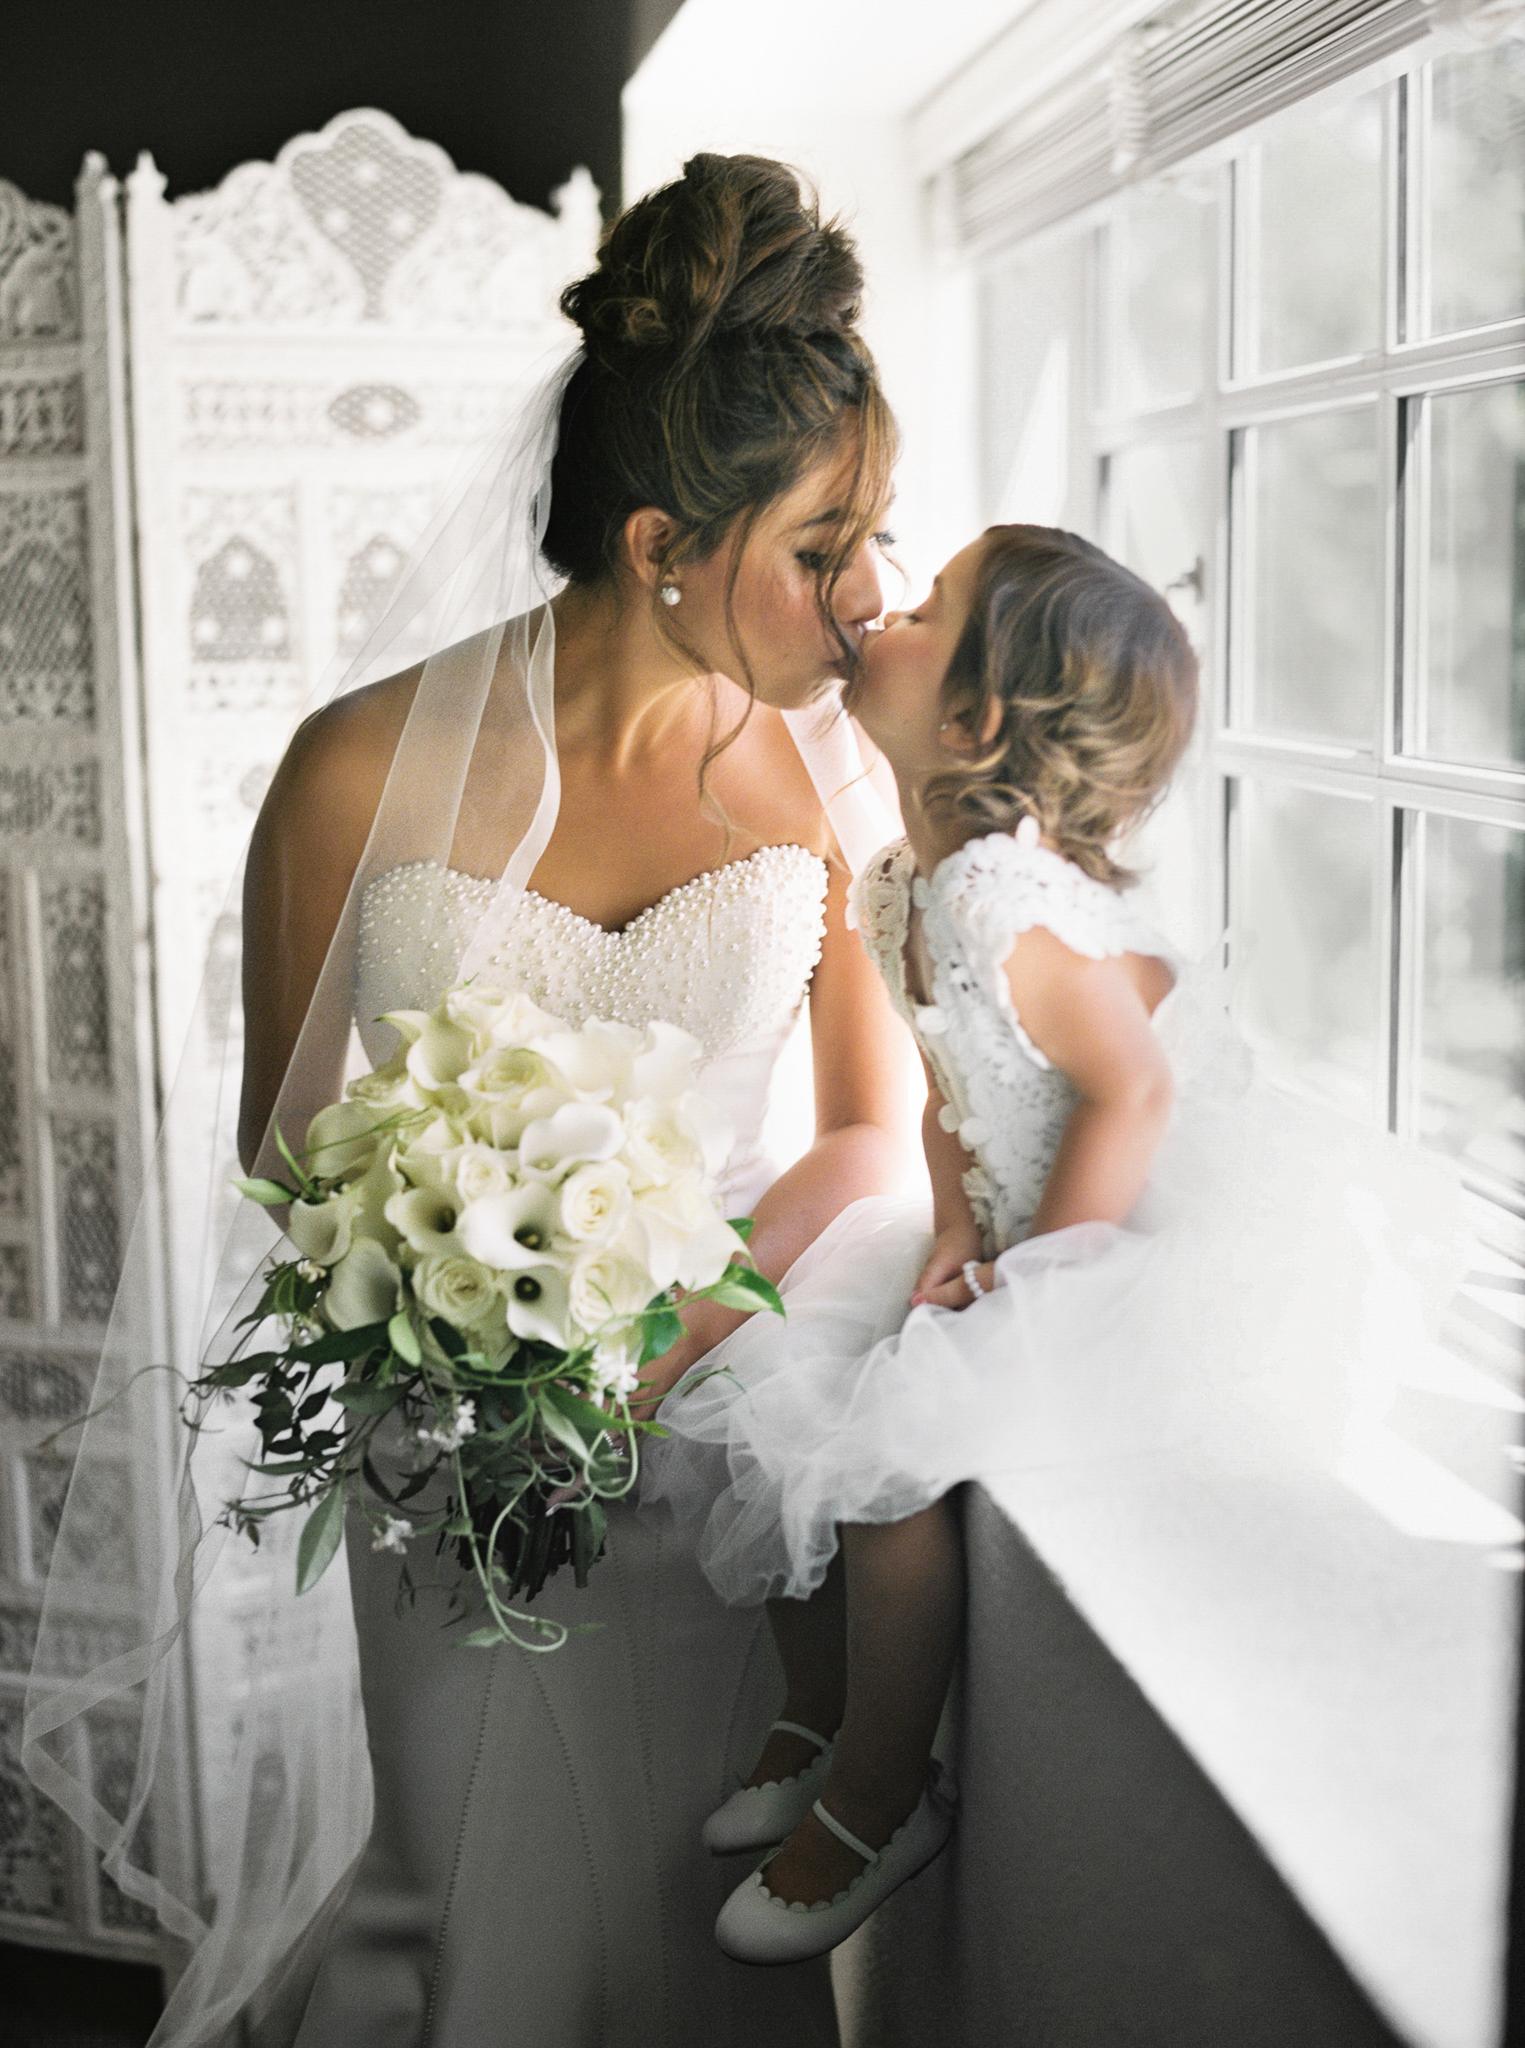 041OutliveCreative_Travel_Photographer_Videographer_Lewis&Clark_Oregon_Elegant_BlackTie_Destination_Wedding.jpg